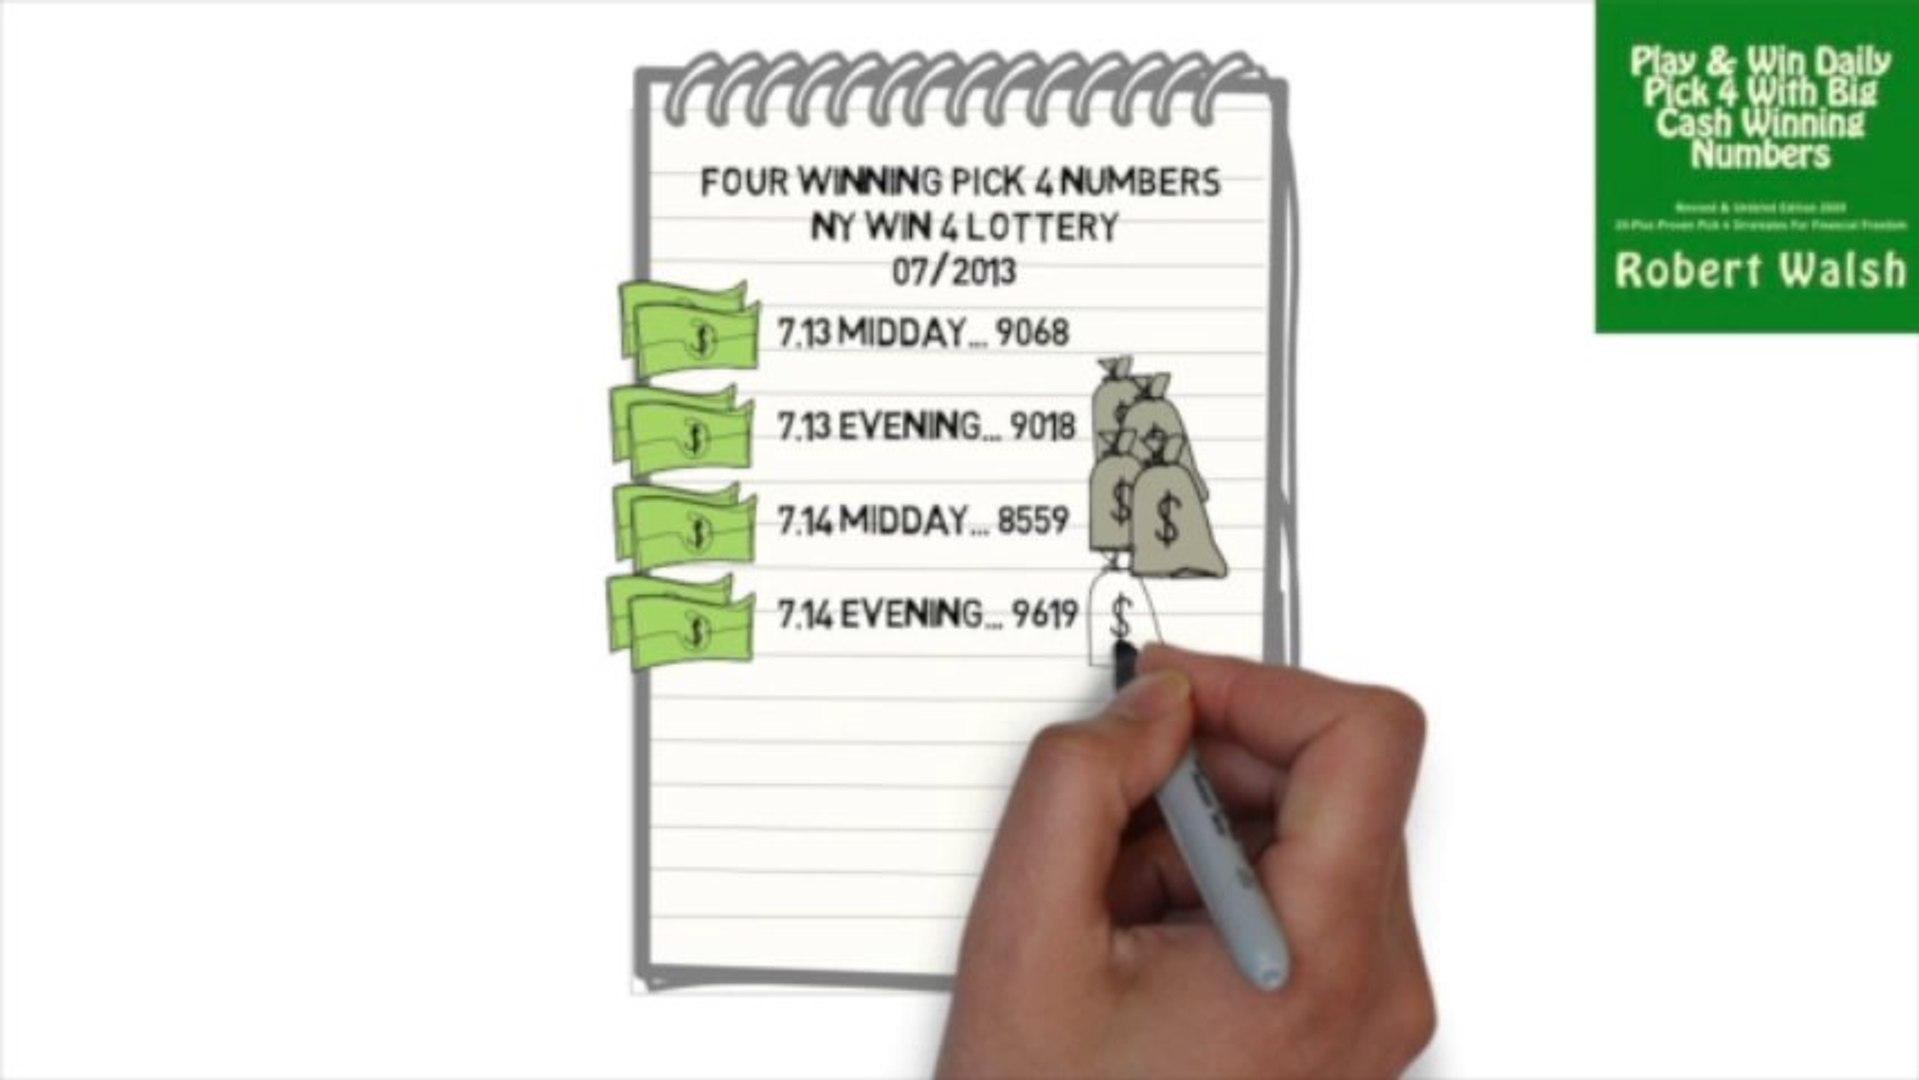 Winning Pick 4 Lottery System